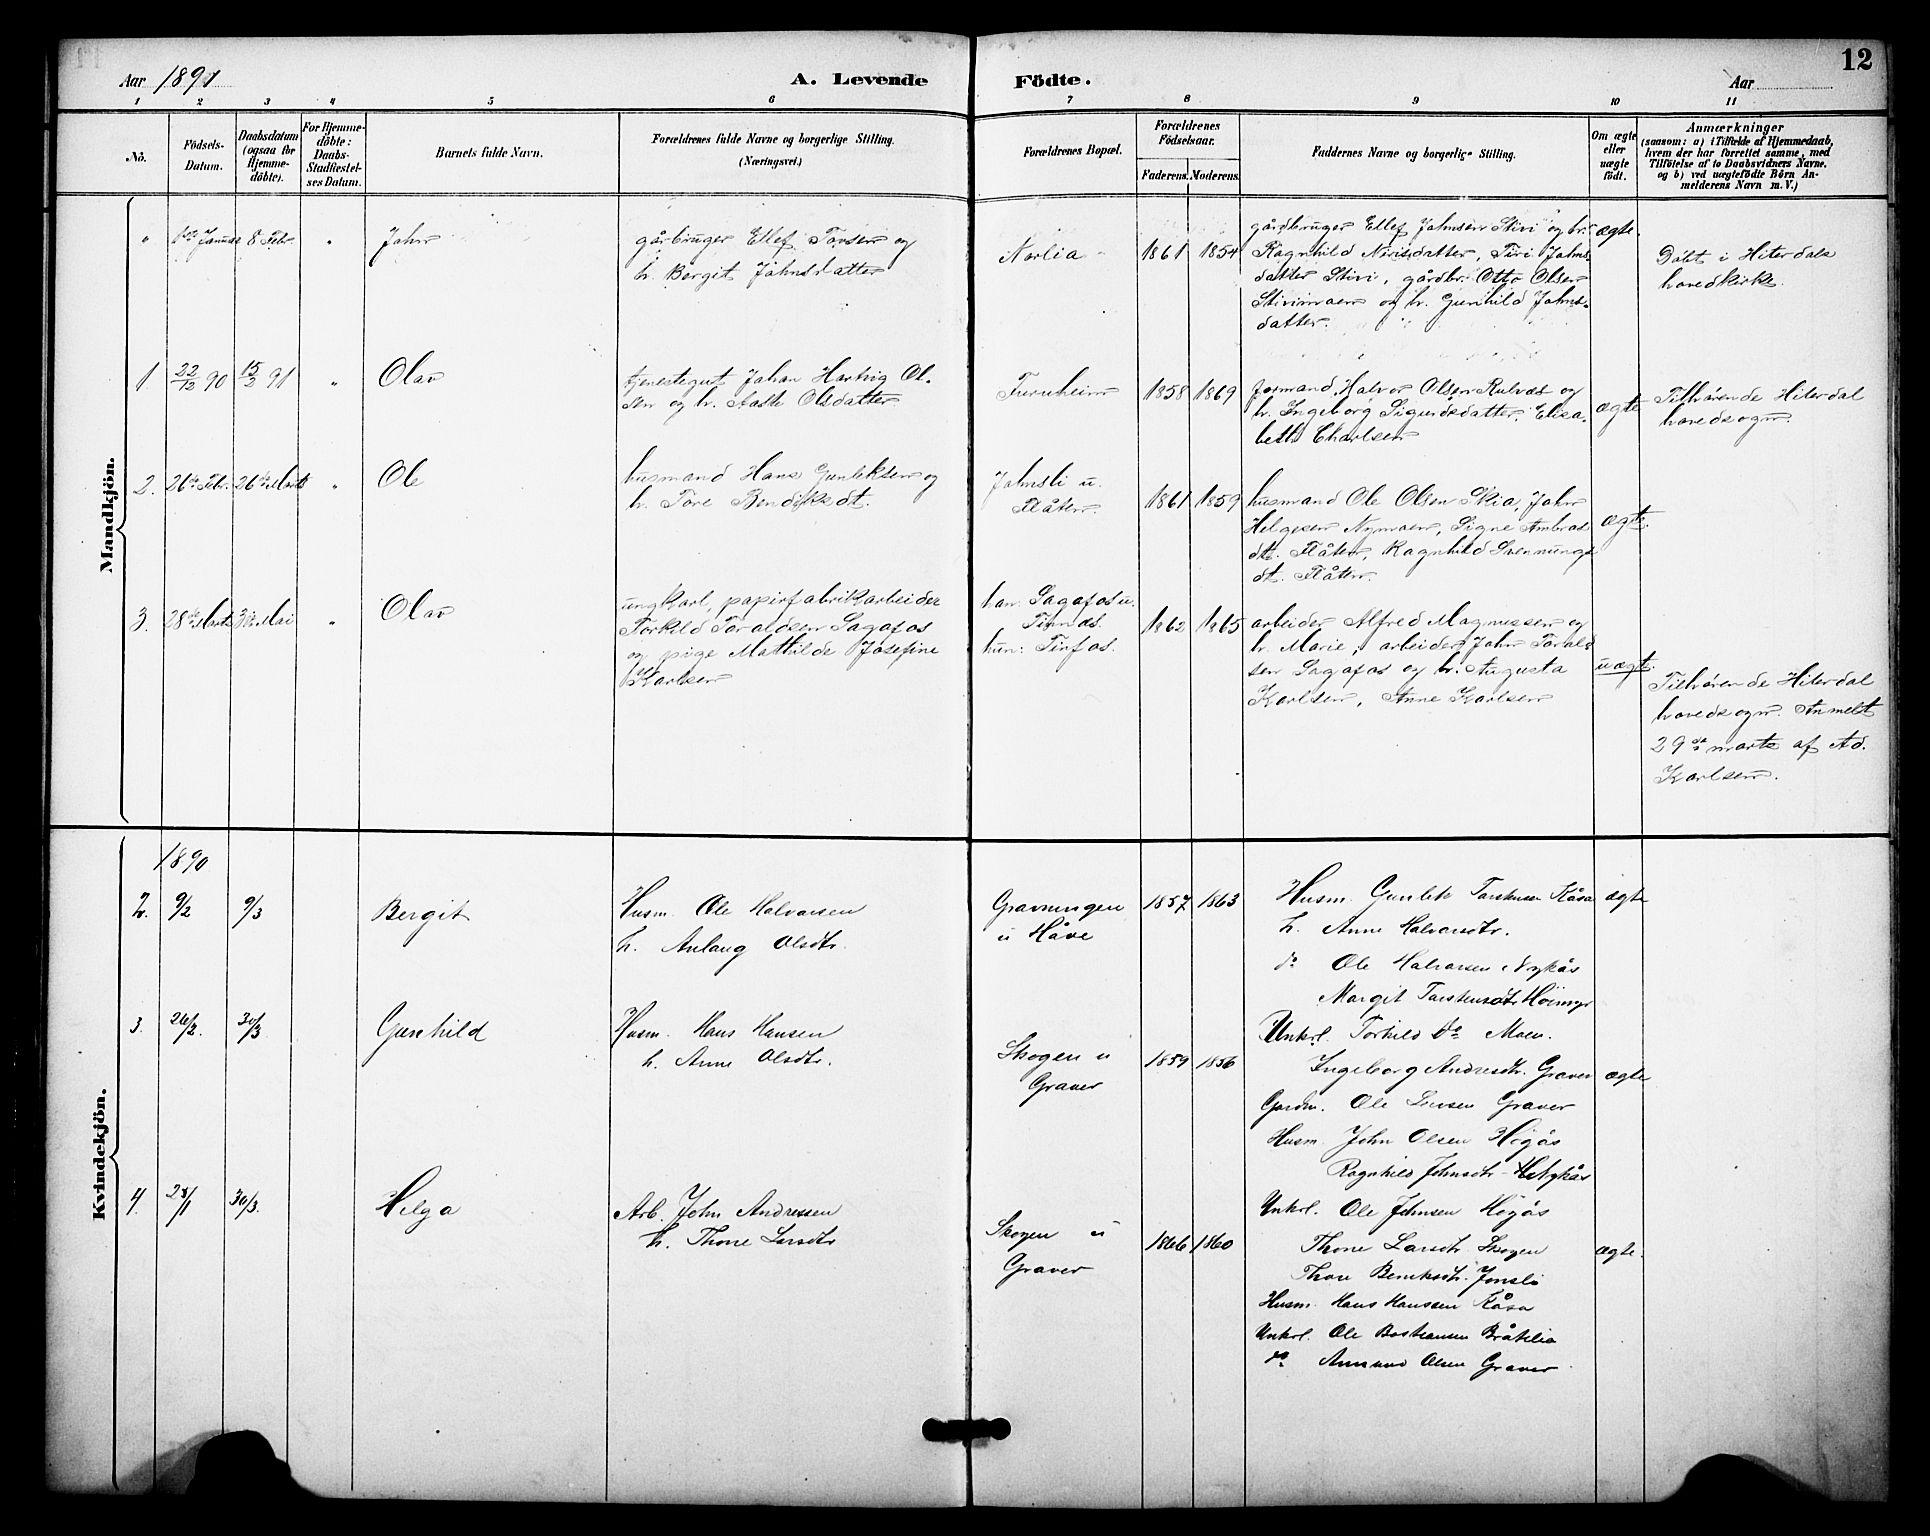 SAKO, Heddal kirkebøker, F/Fb/L0001: Ministerialbok nr. II 1, 1884-1910, s. 12